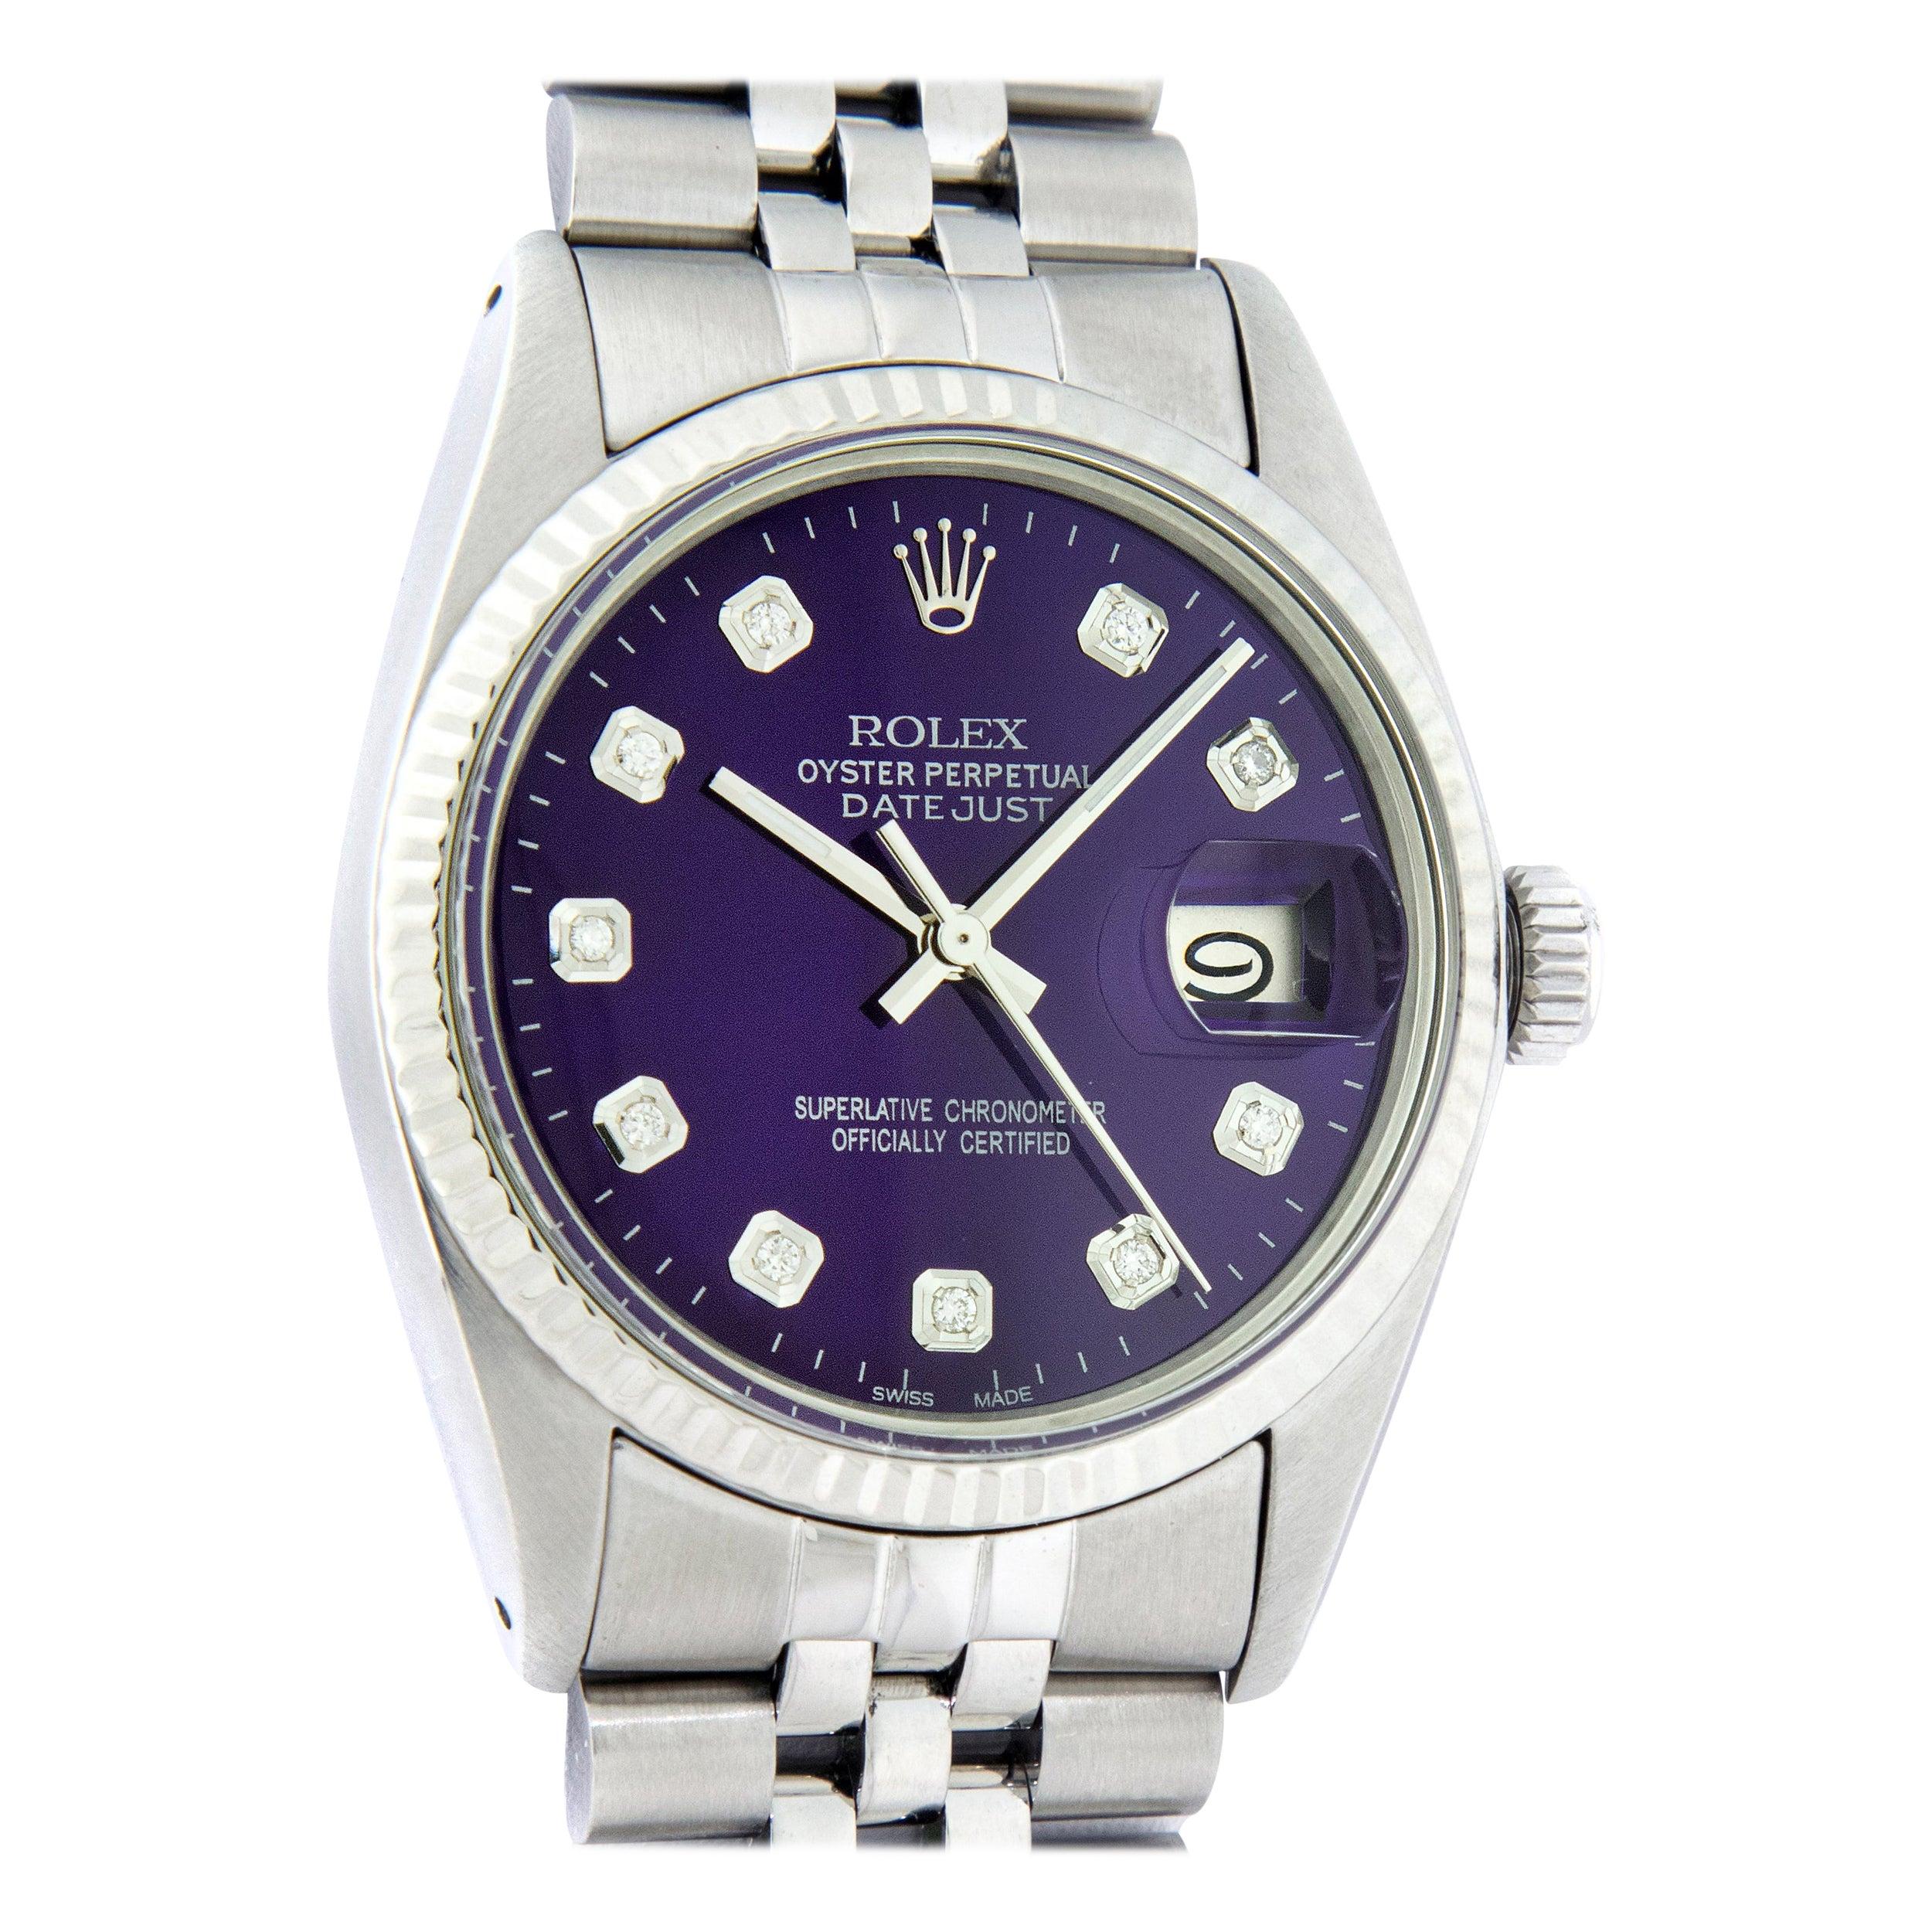 Rolex Men's Datejust Stainless Steel Purple Diamond Fluted Bezel Watch